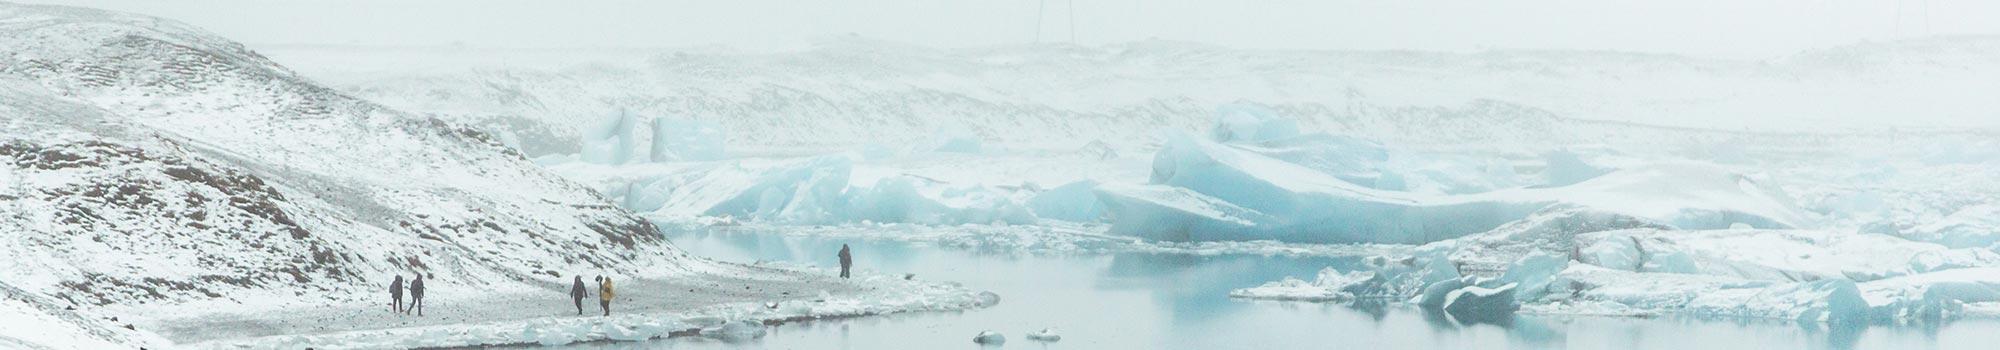 glacier-lagoon-winter-wonderland